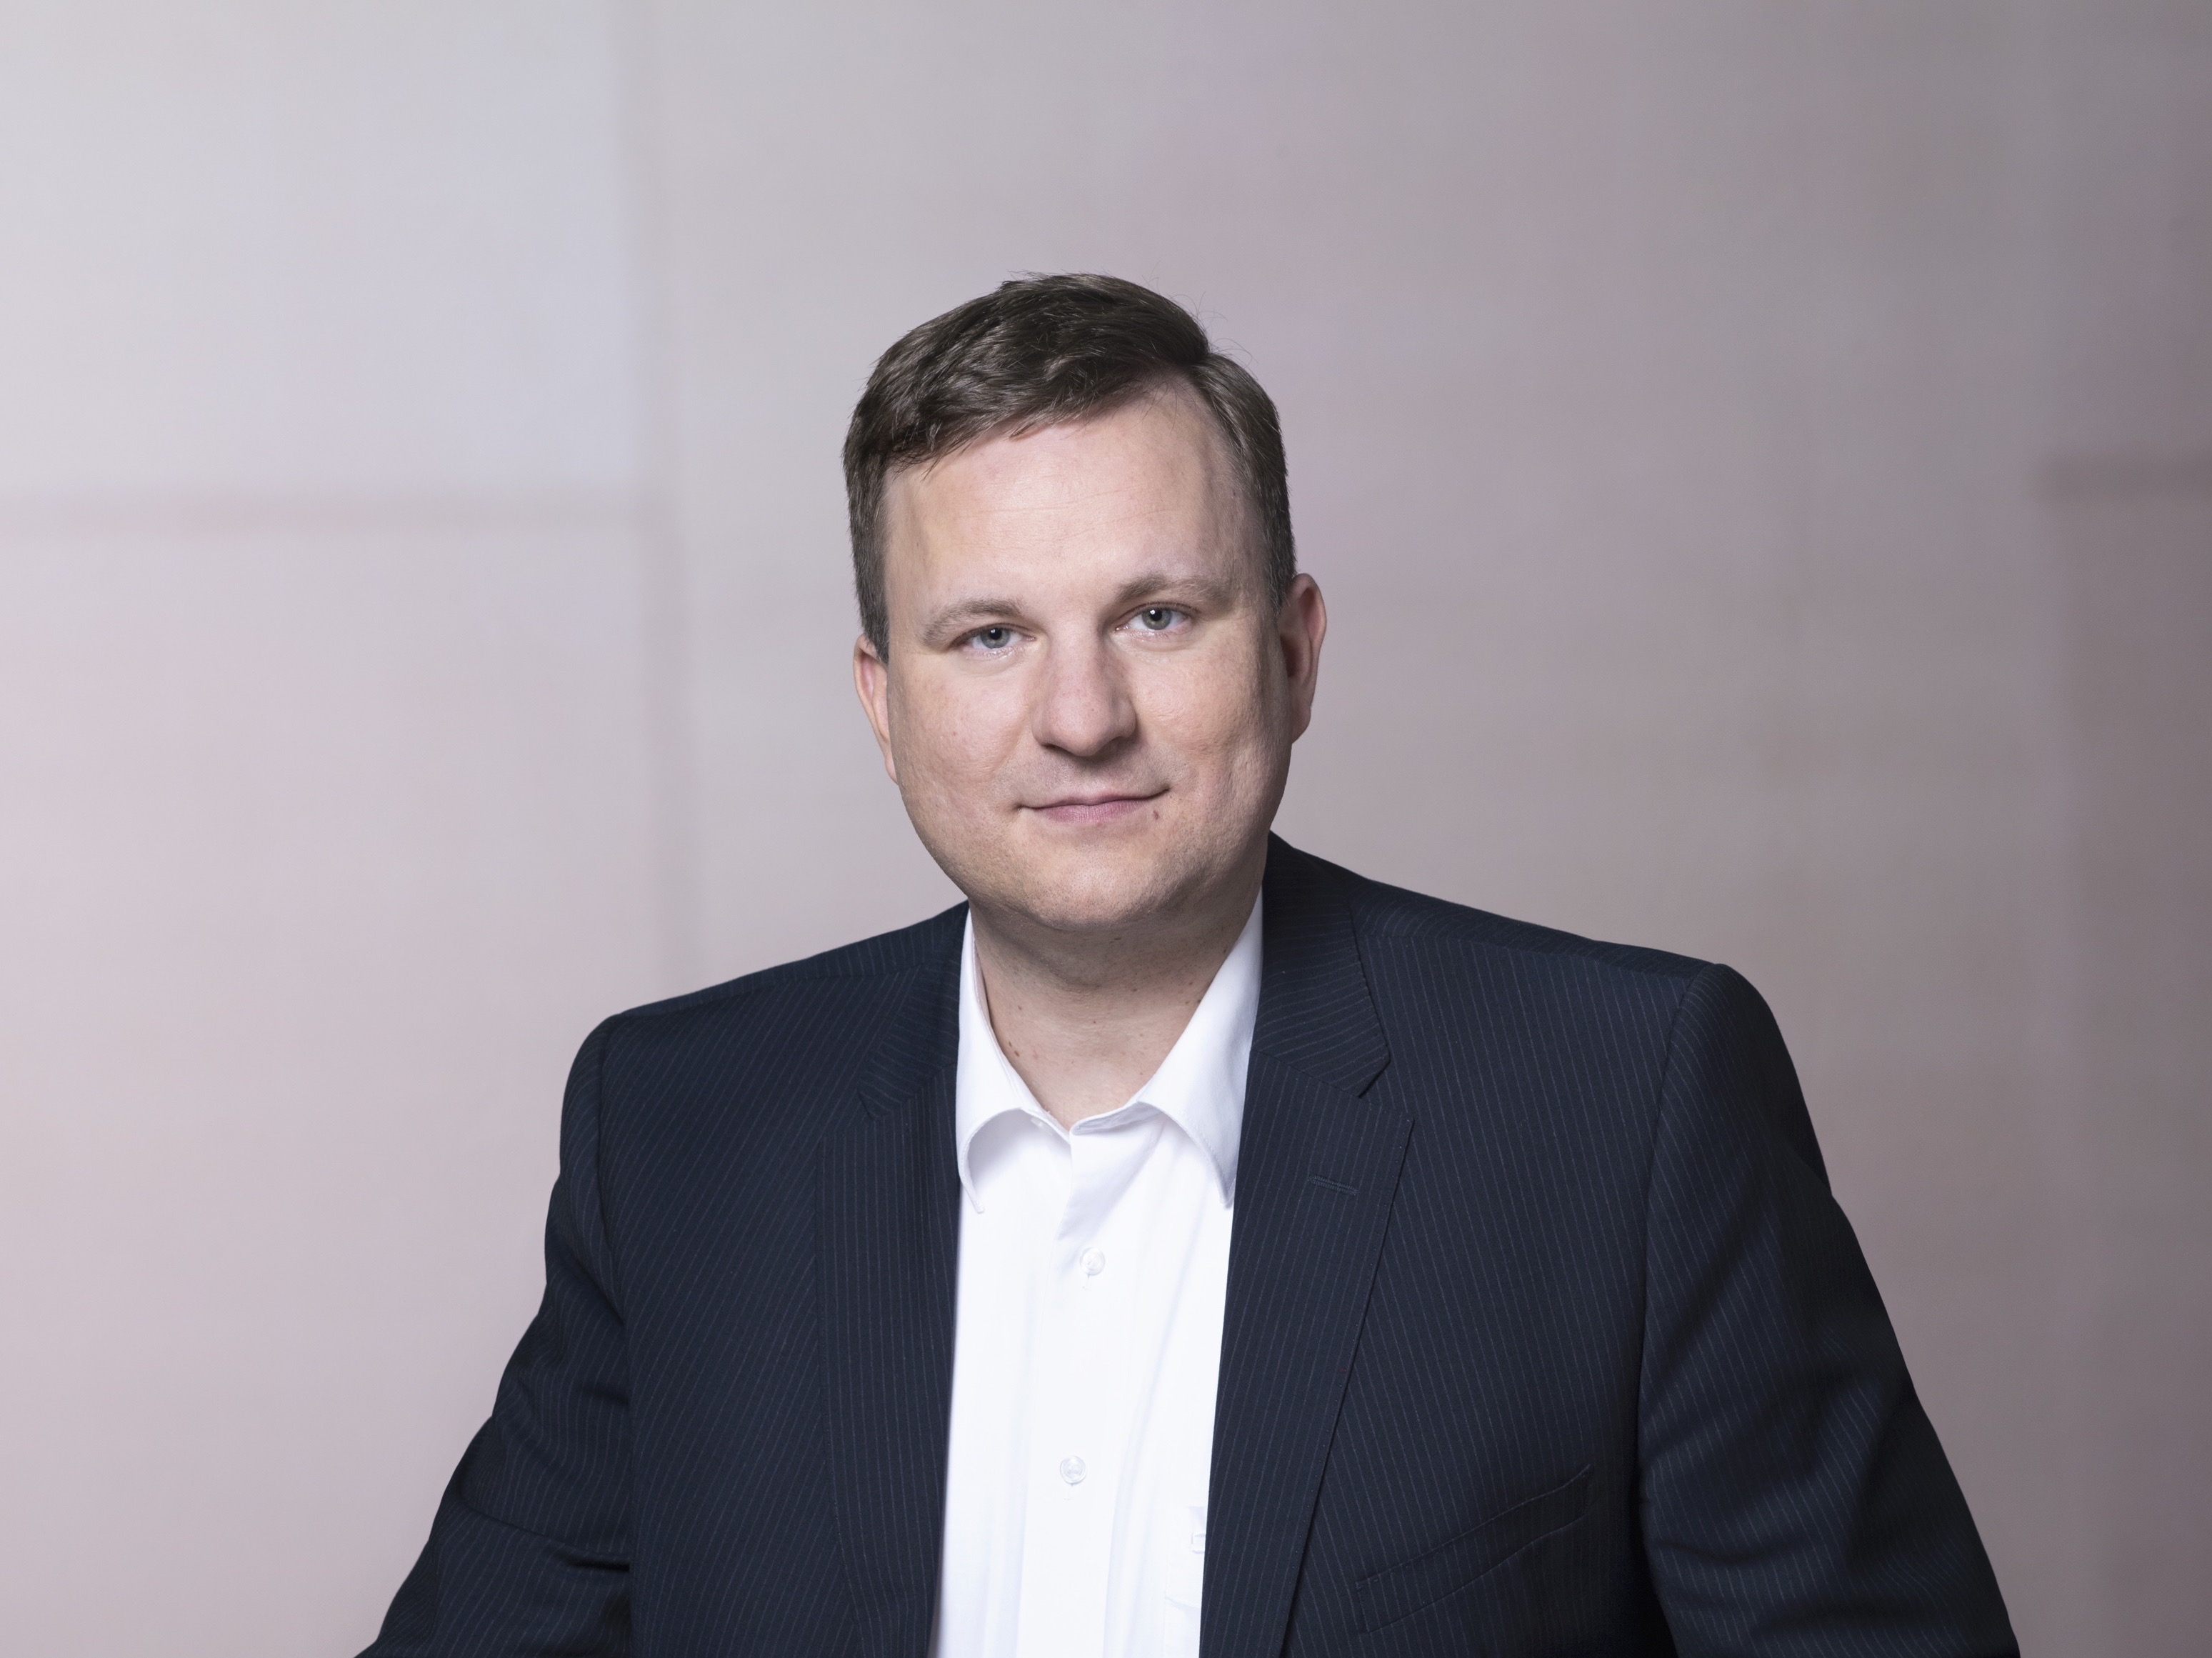 Steeven Bretz, Generalsekretär